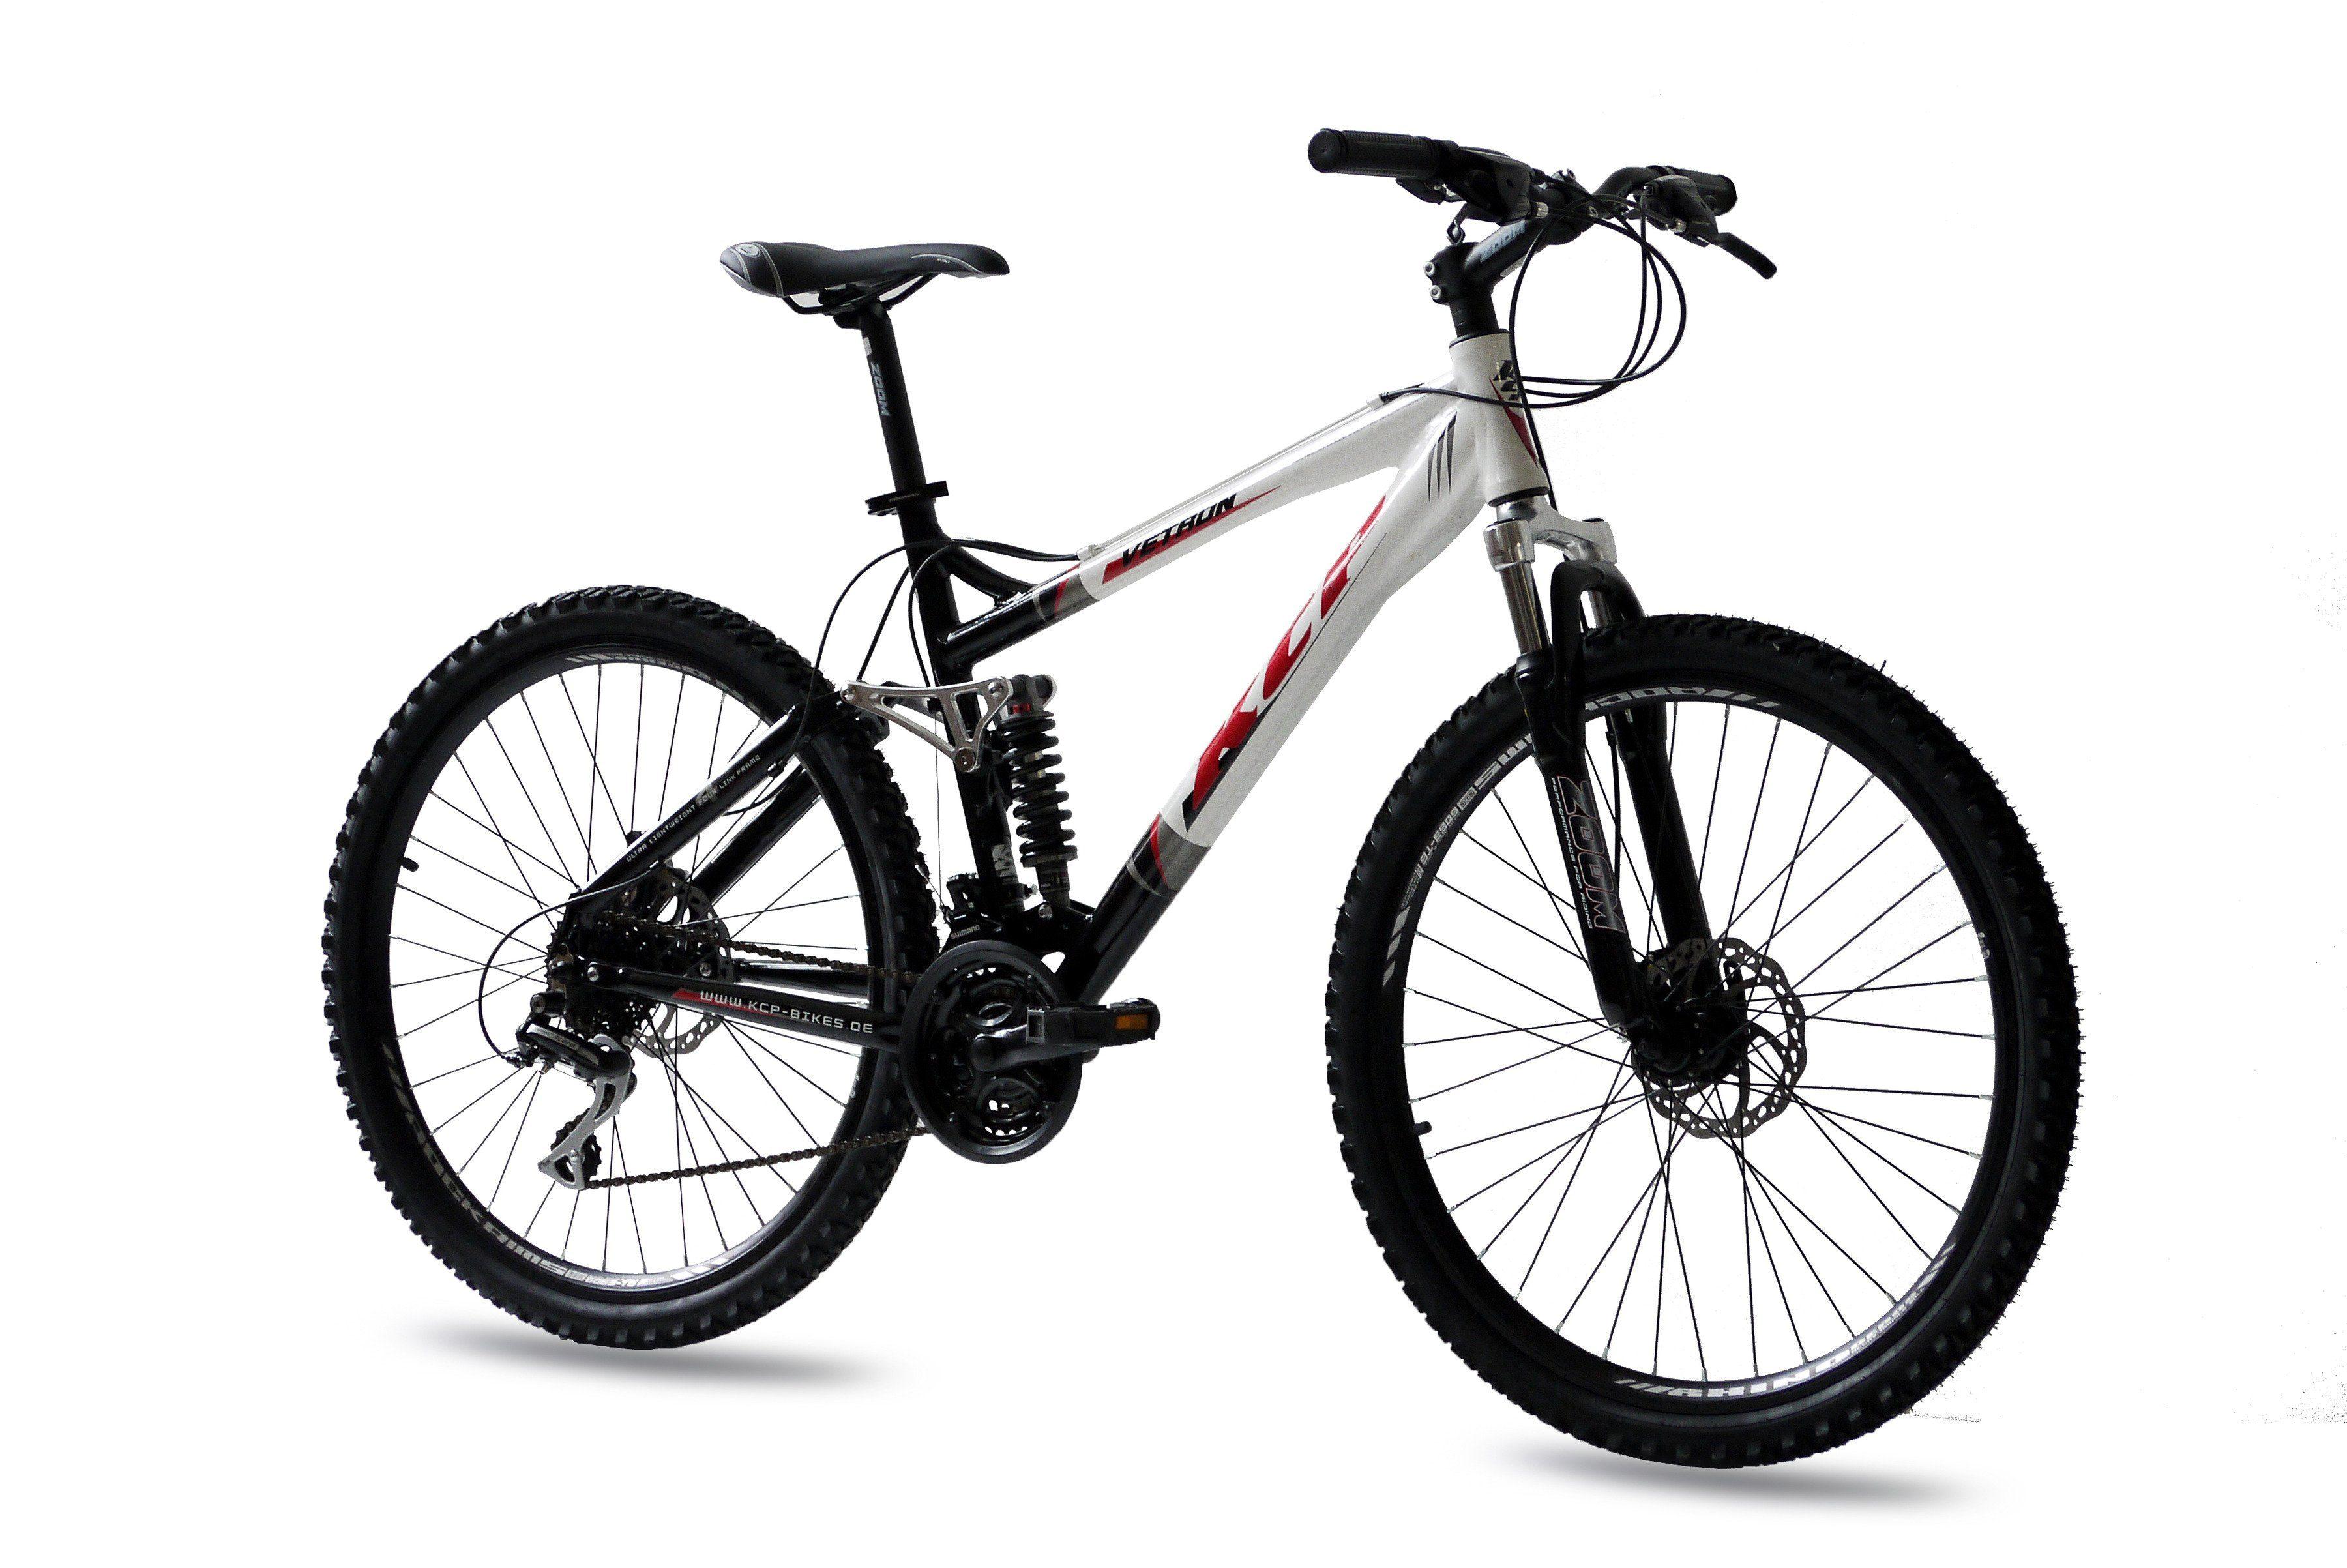 KCP Mountainbike »Vetron, 66,04 cm (26 Zoll)«